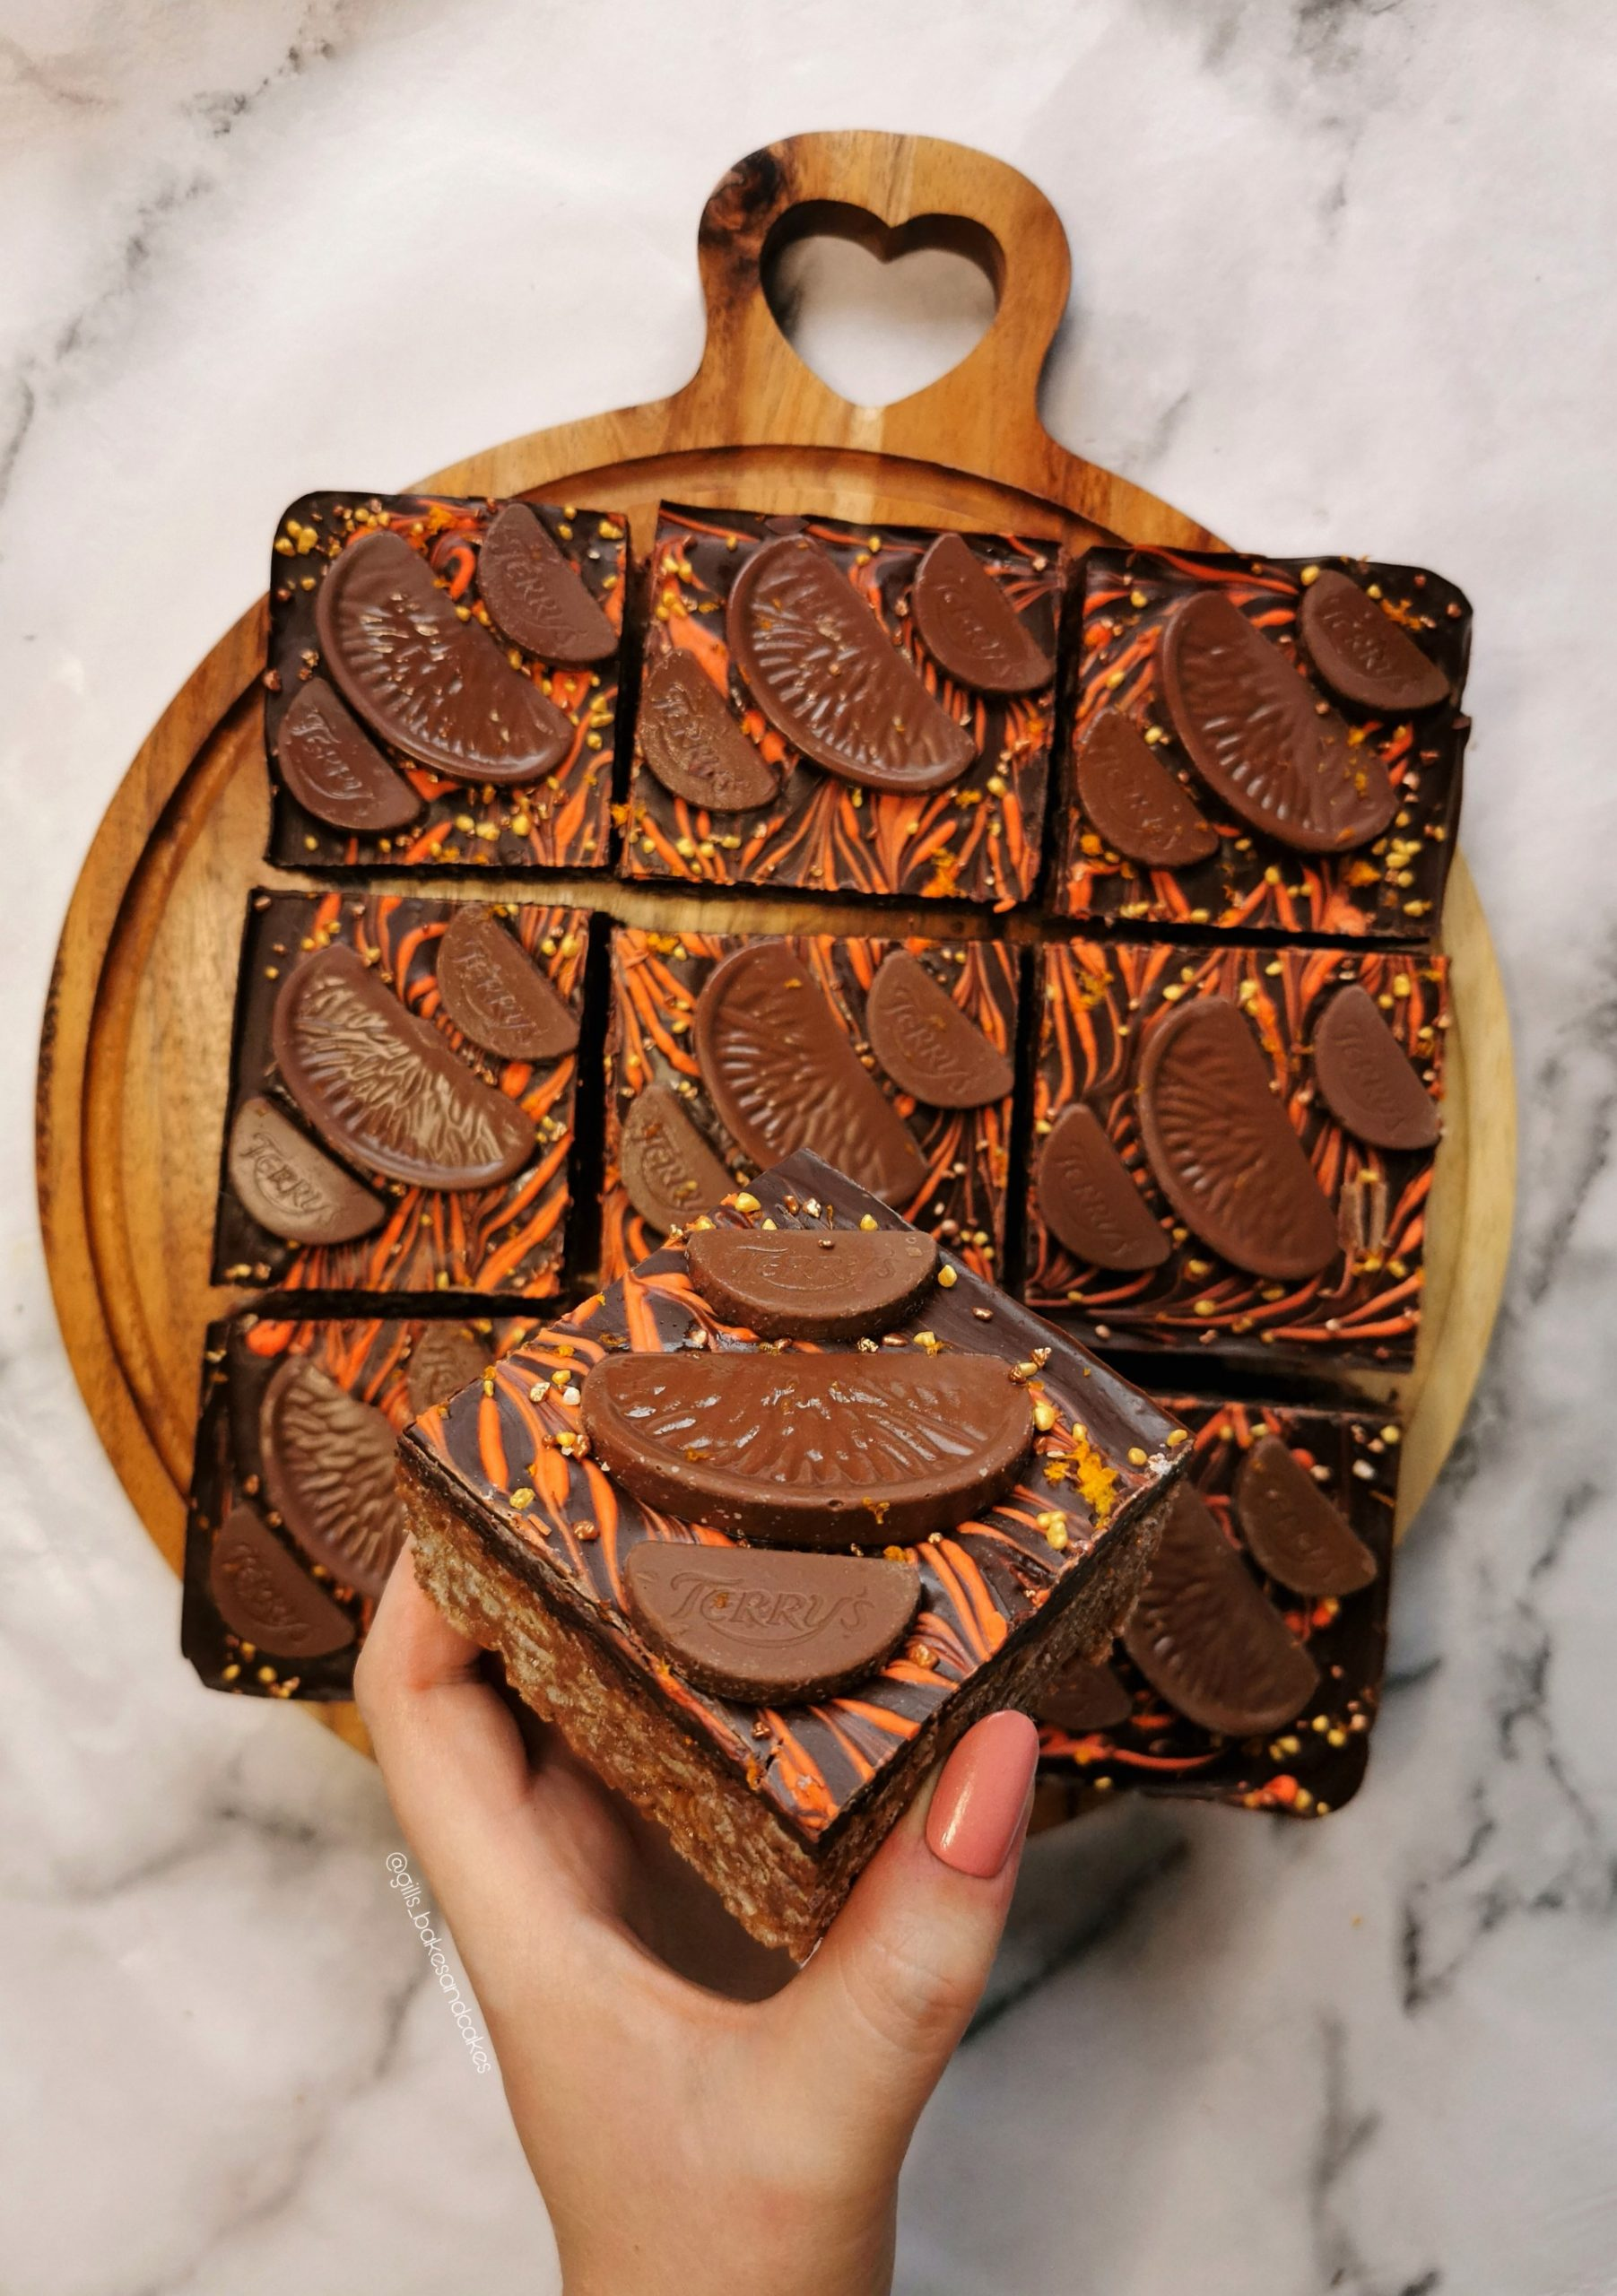 Terry's Chocolate Orange Rice Krispie Squares